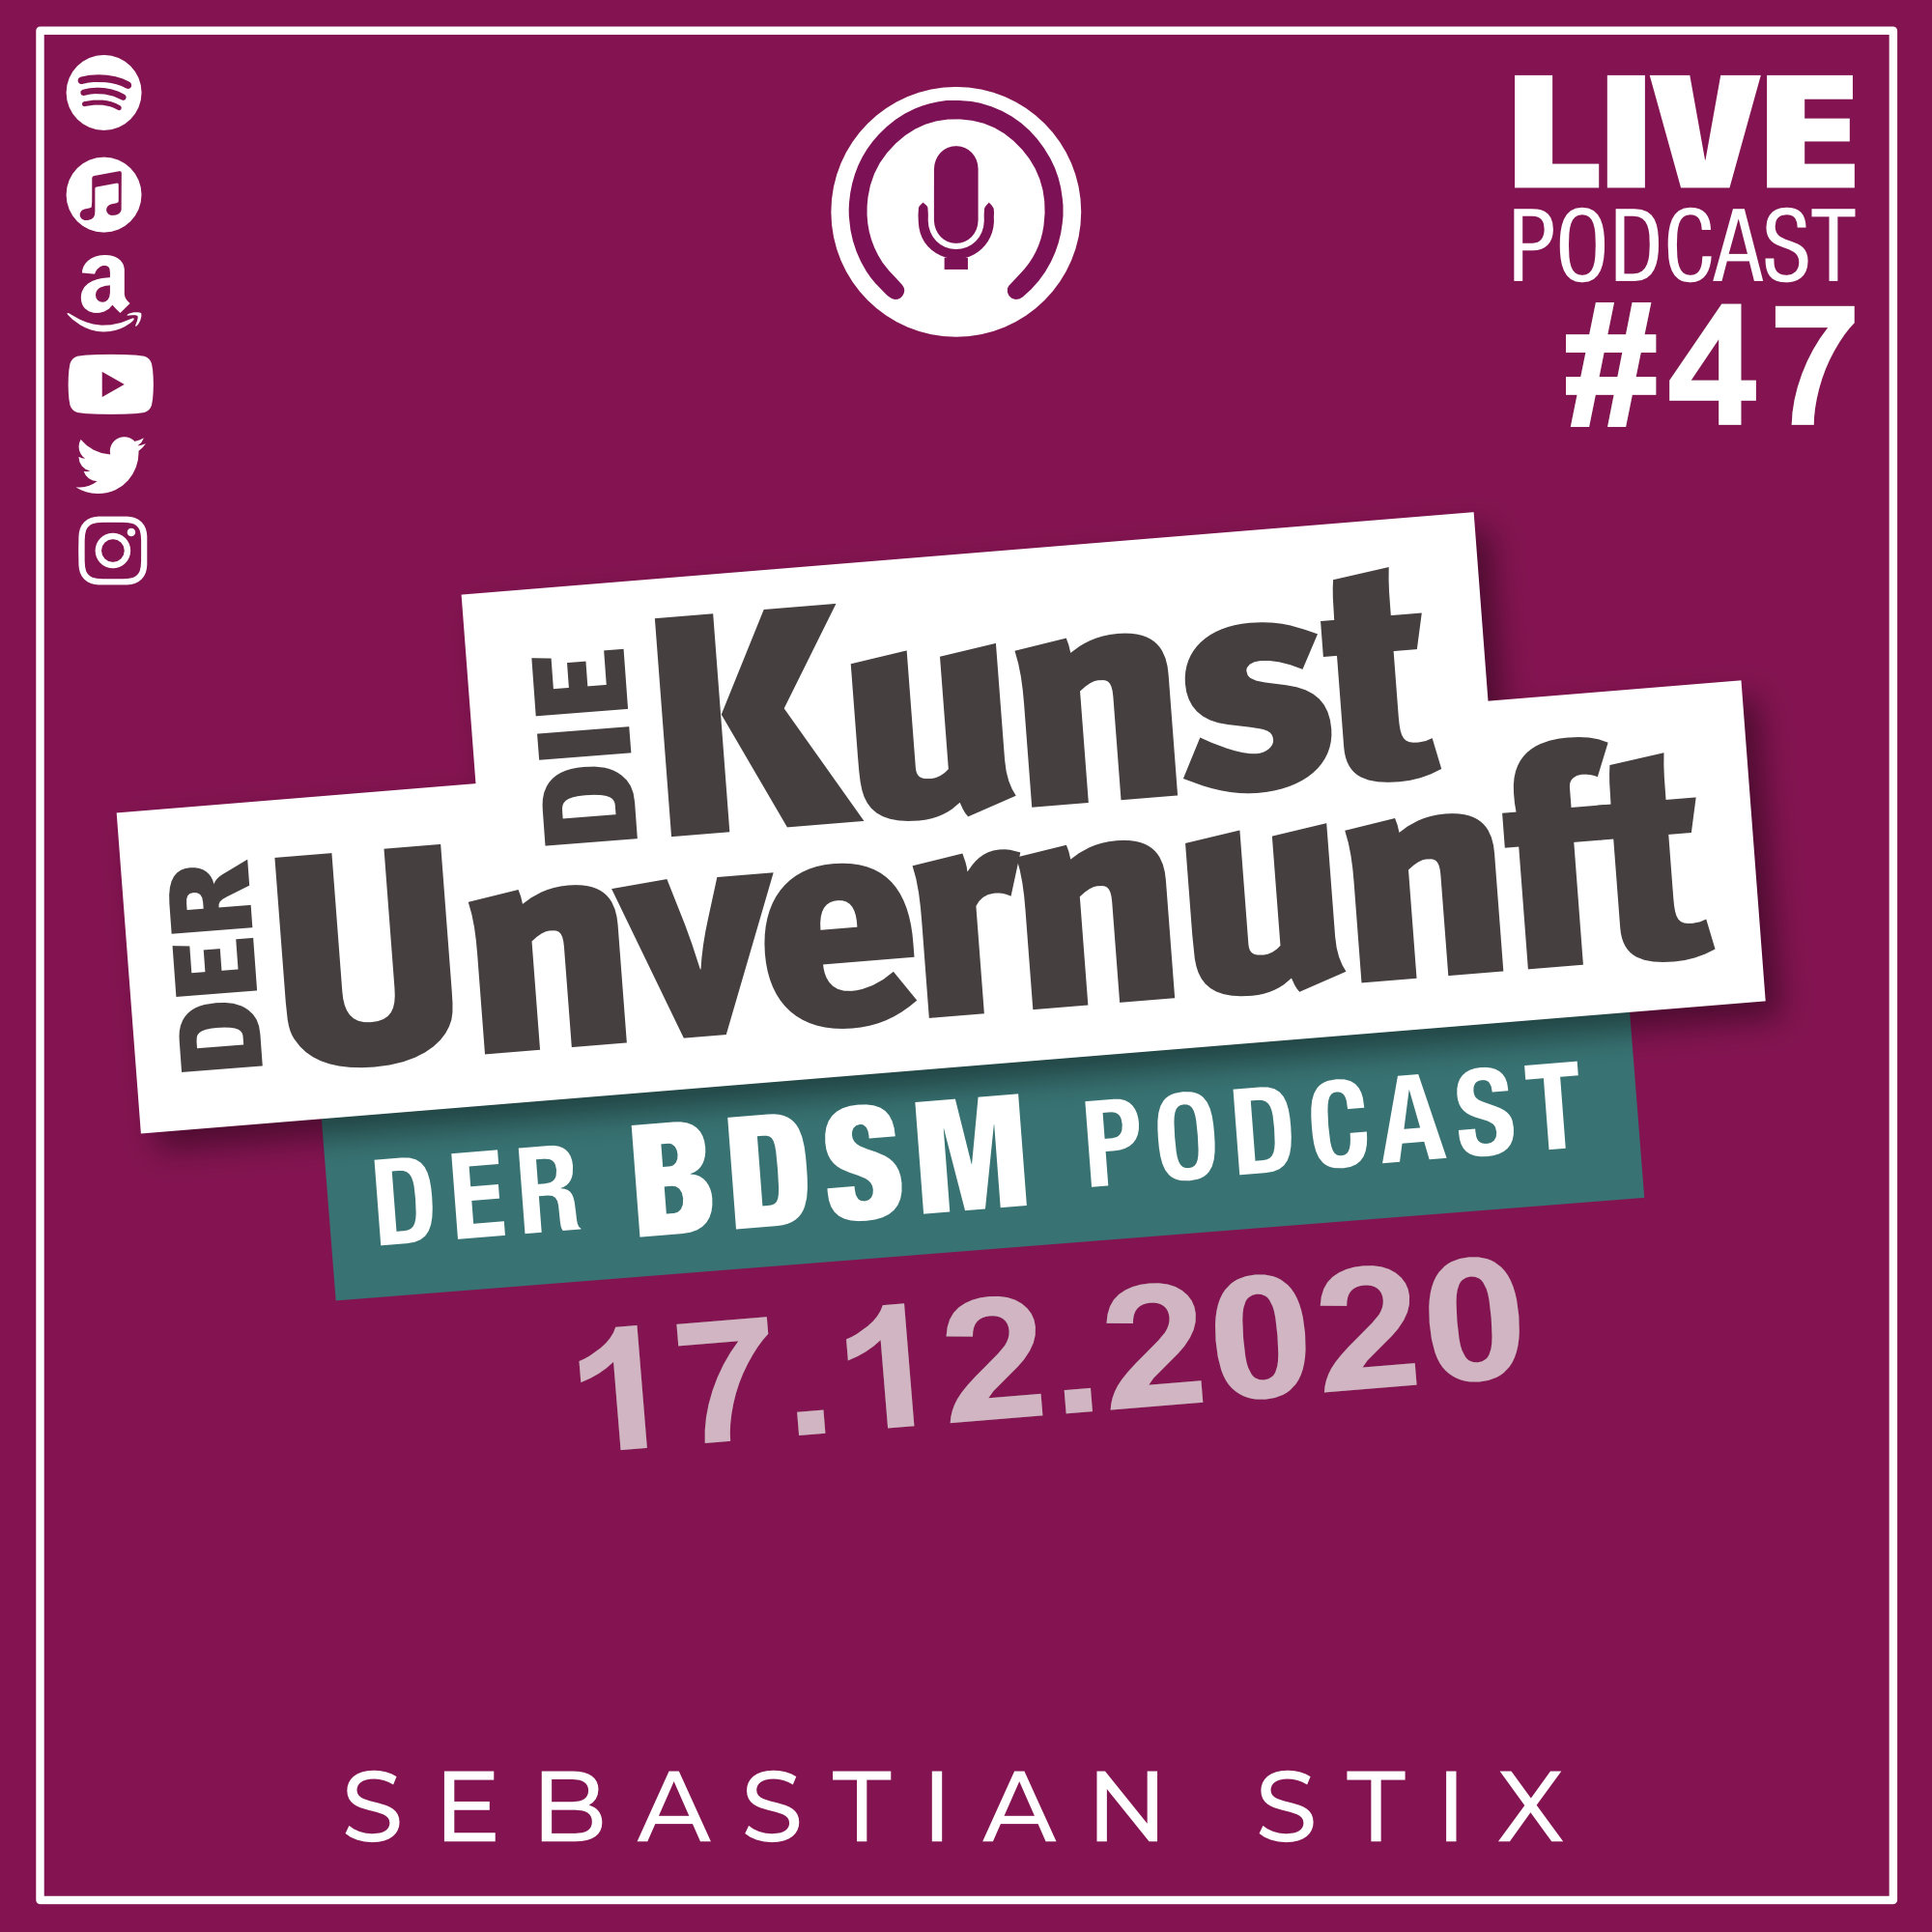 Unvernunft Live 17.12.2020 - Gay-BDSM & Jahresendrituale